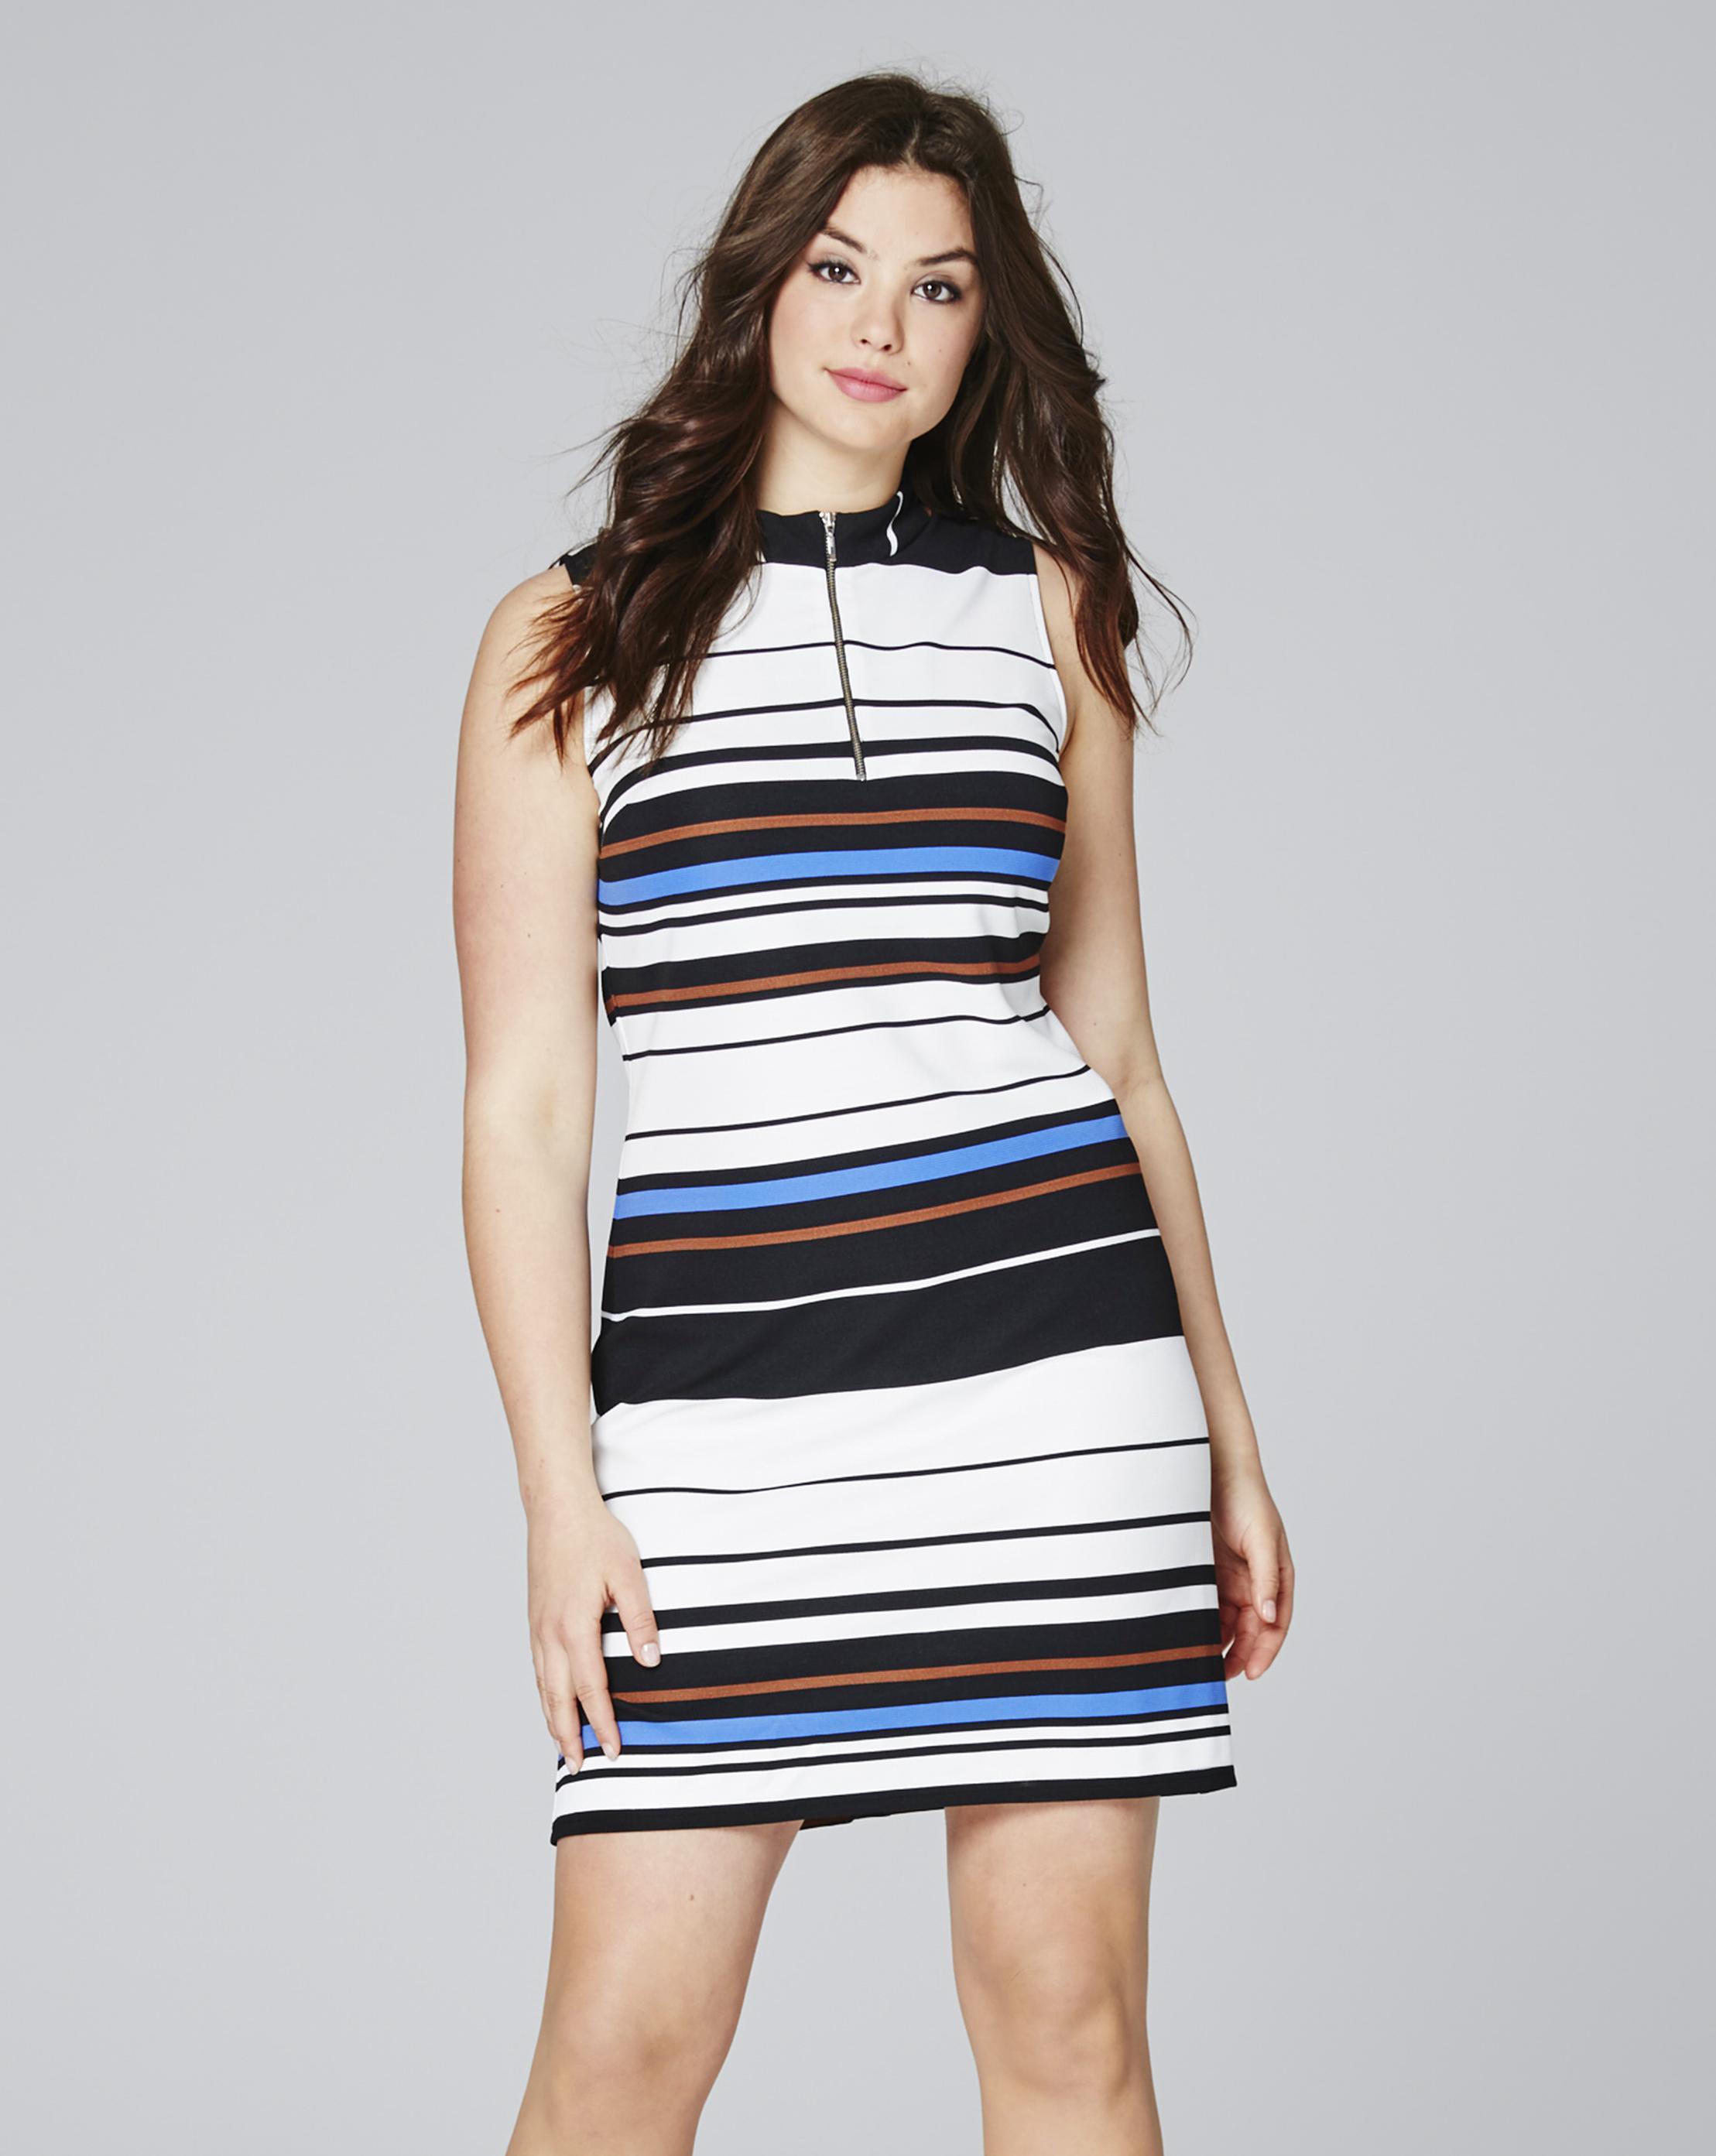 d6ea42be01a Lyst - Simply Be Multi Stripe High Neck Rib Bodycon Dress in Blue